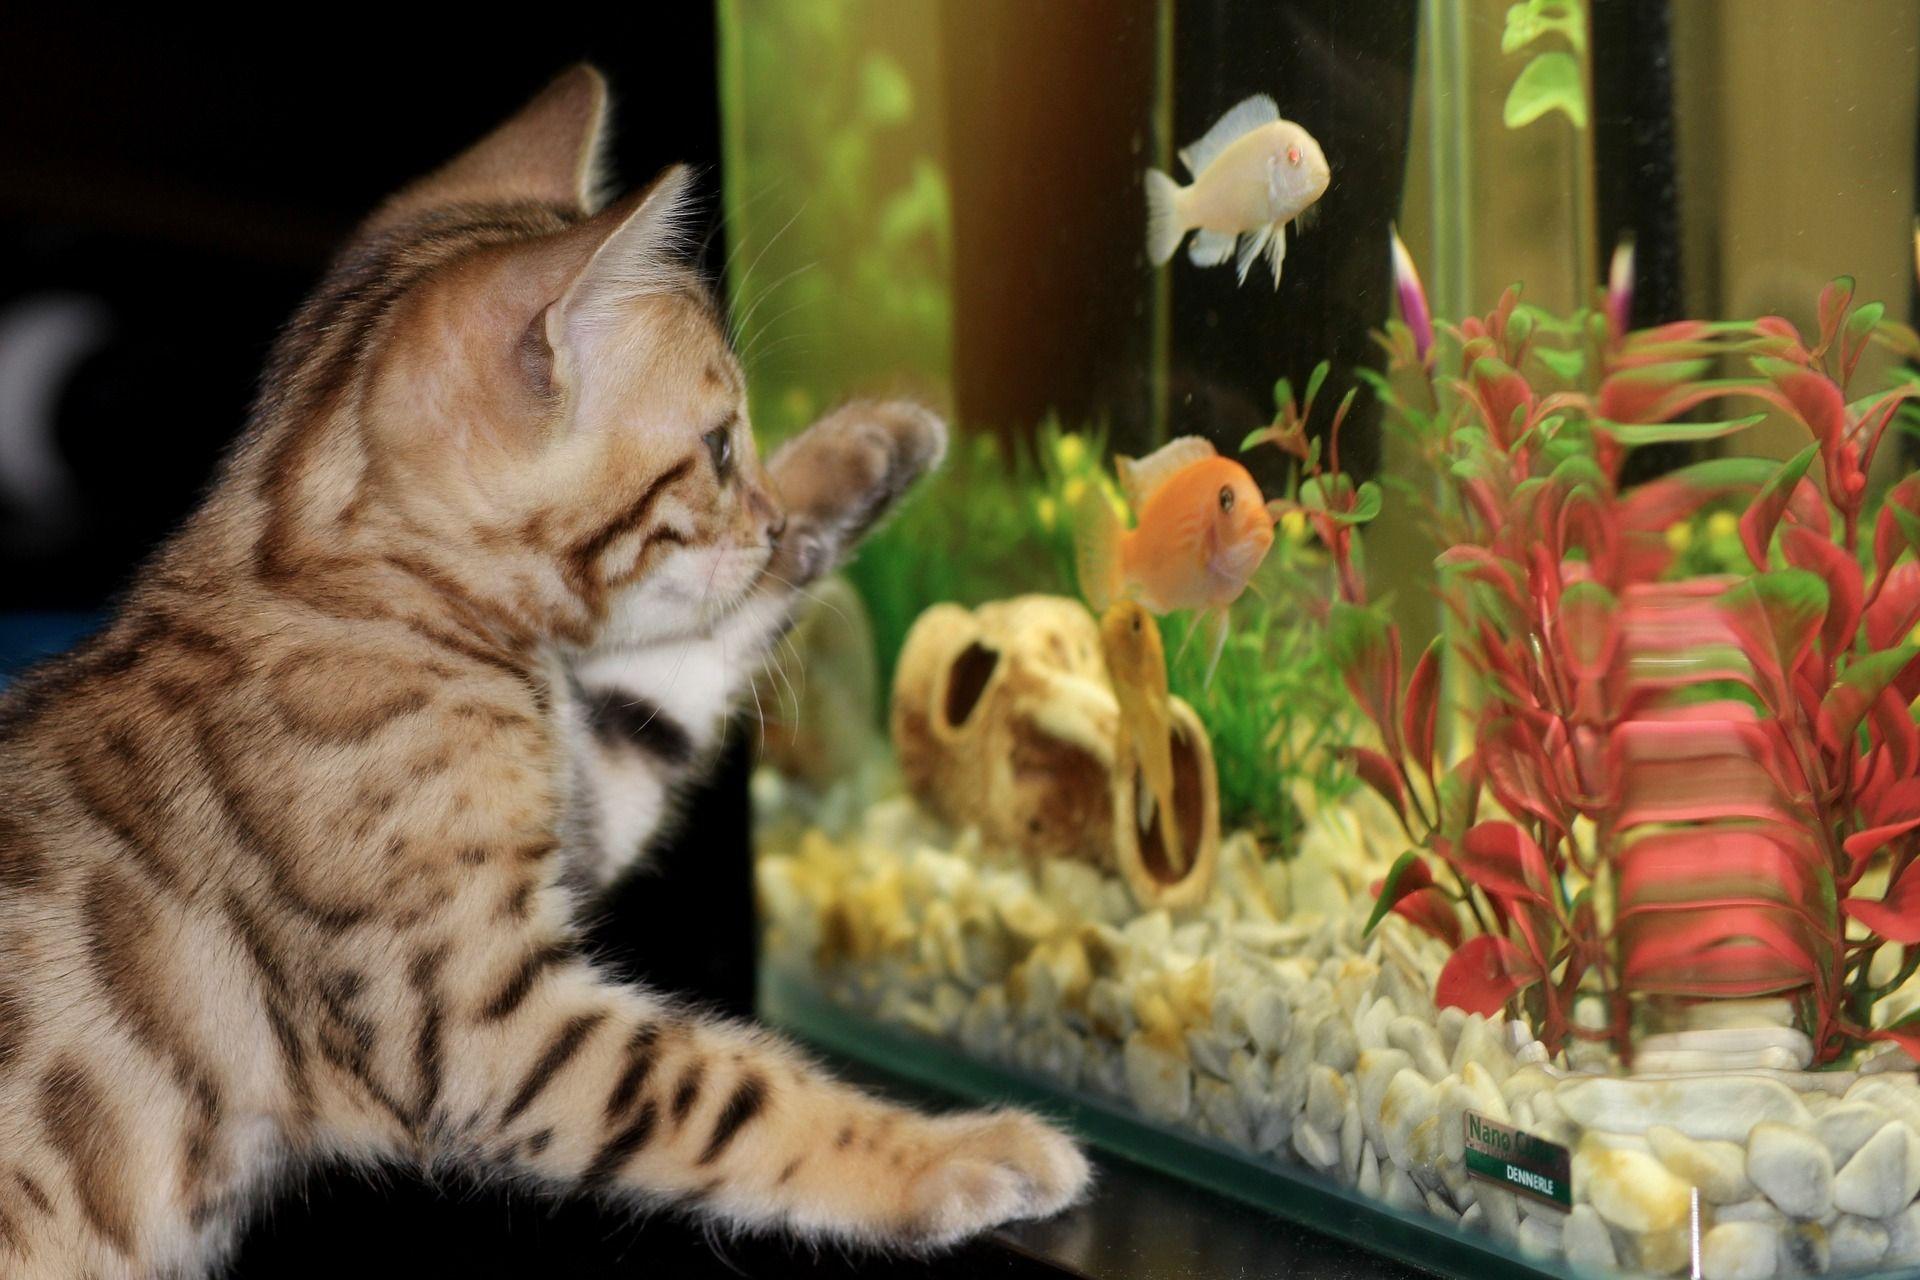 55 Gallon Fish Tank Guide Here S What You Need Betta Fish Aquarium Fish Antibiotics